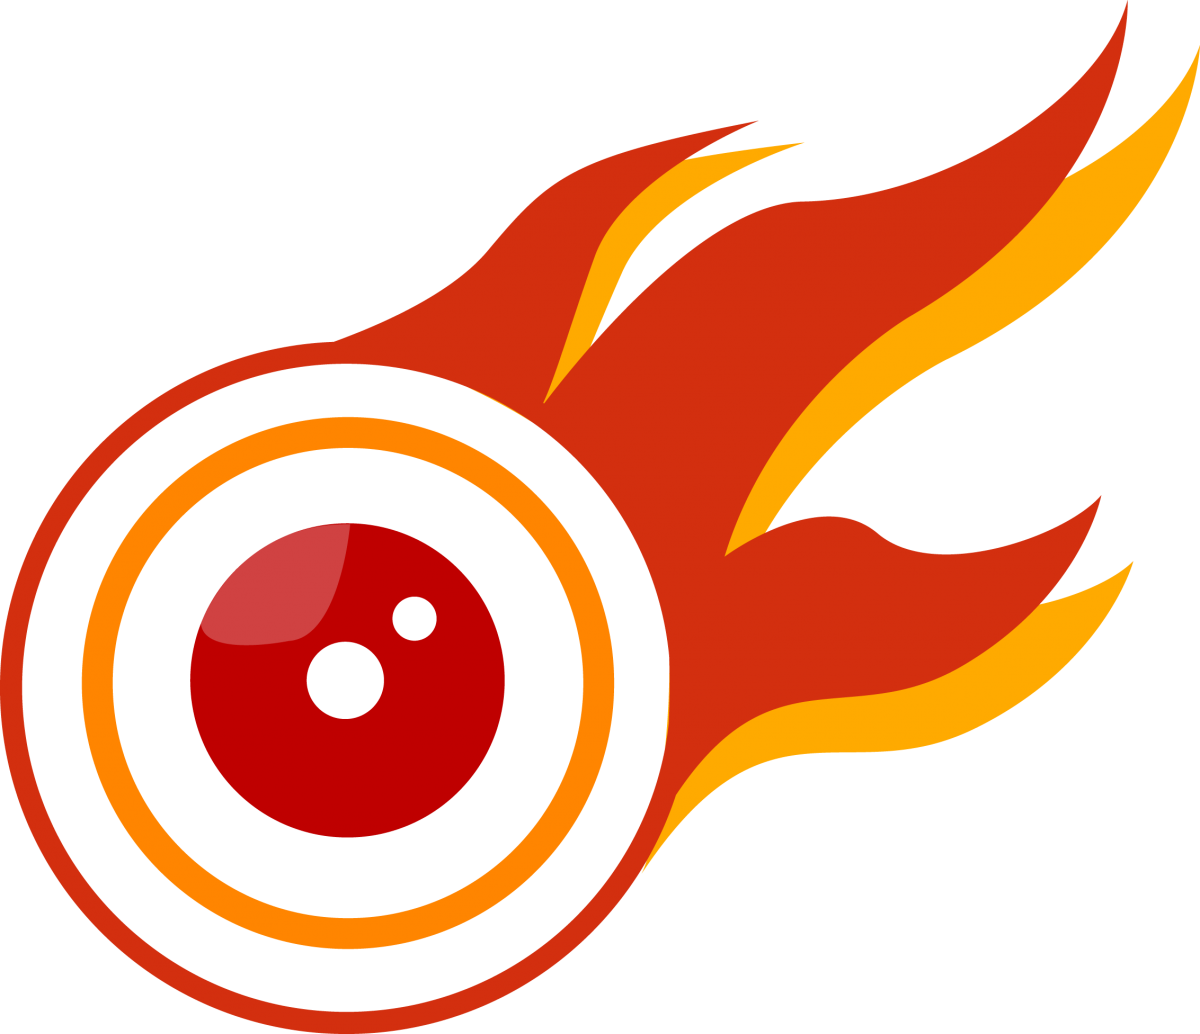 Flame Shots